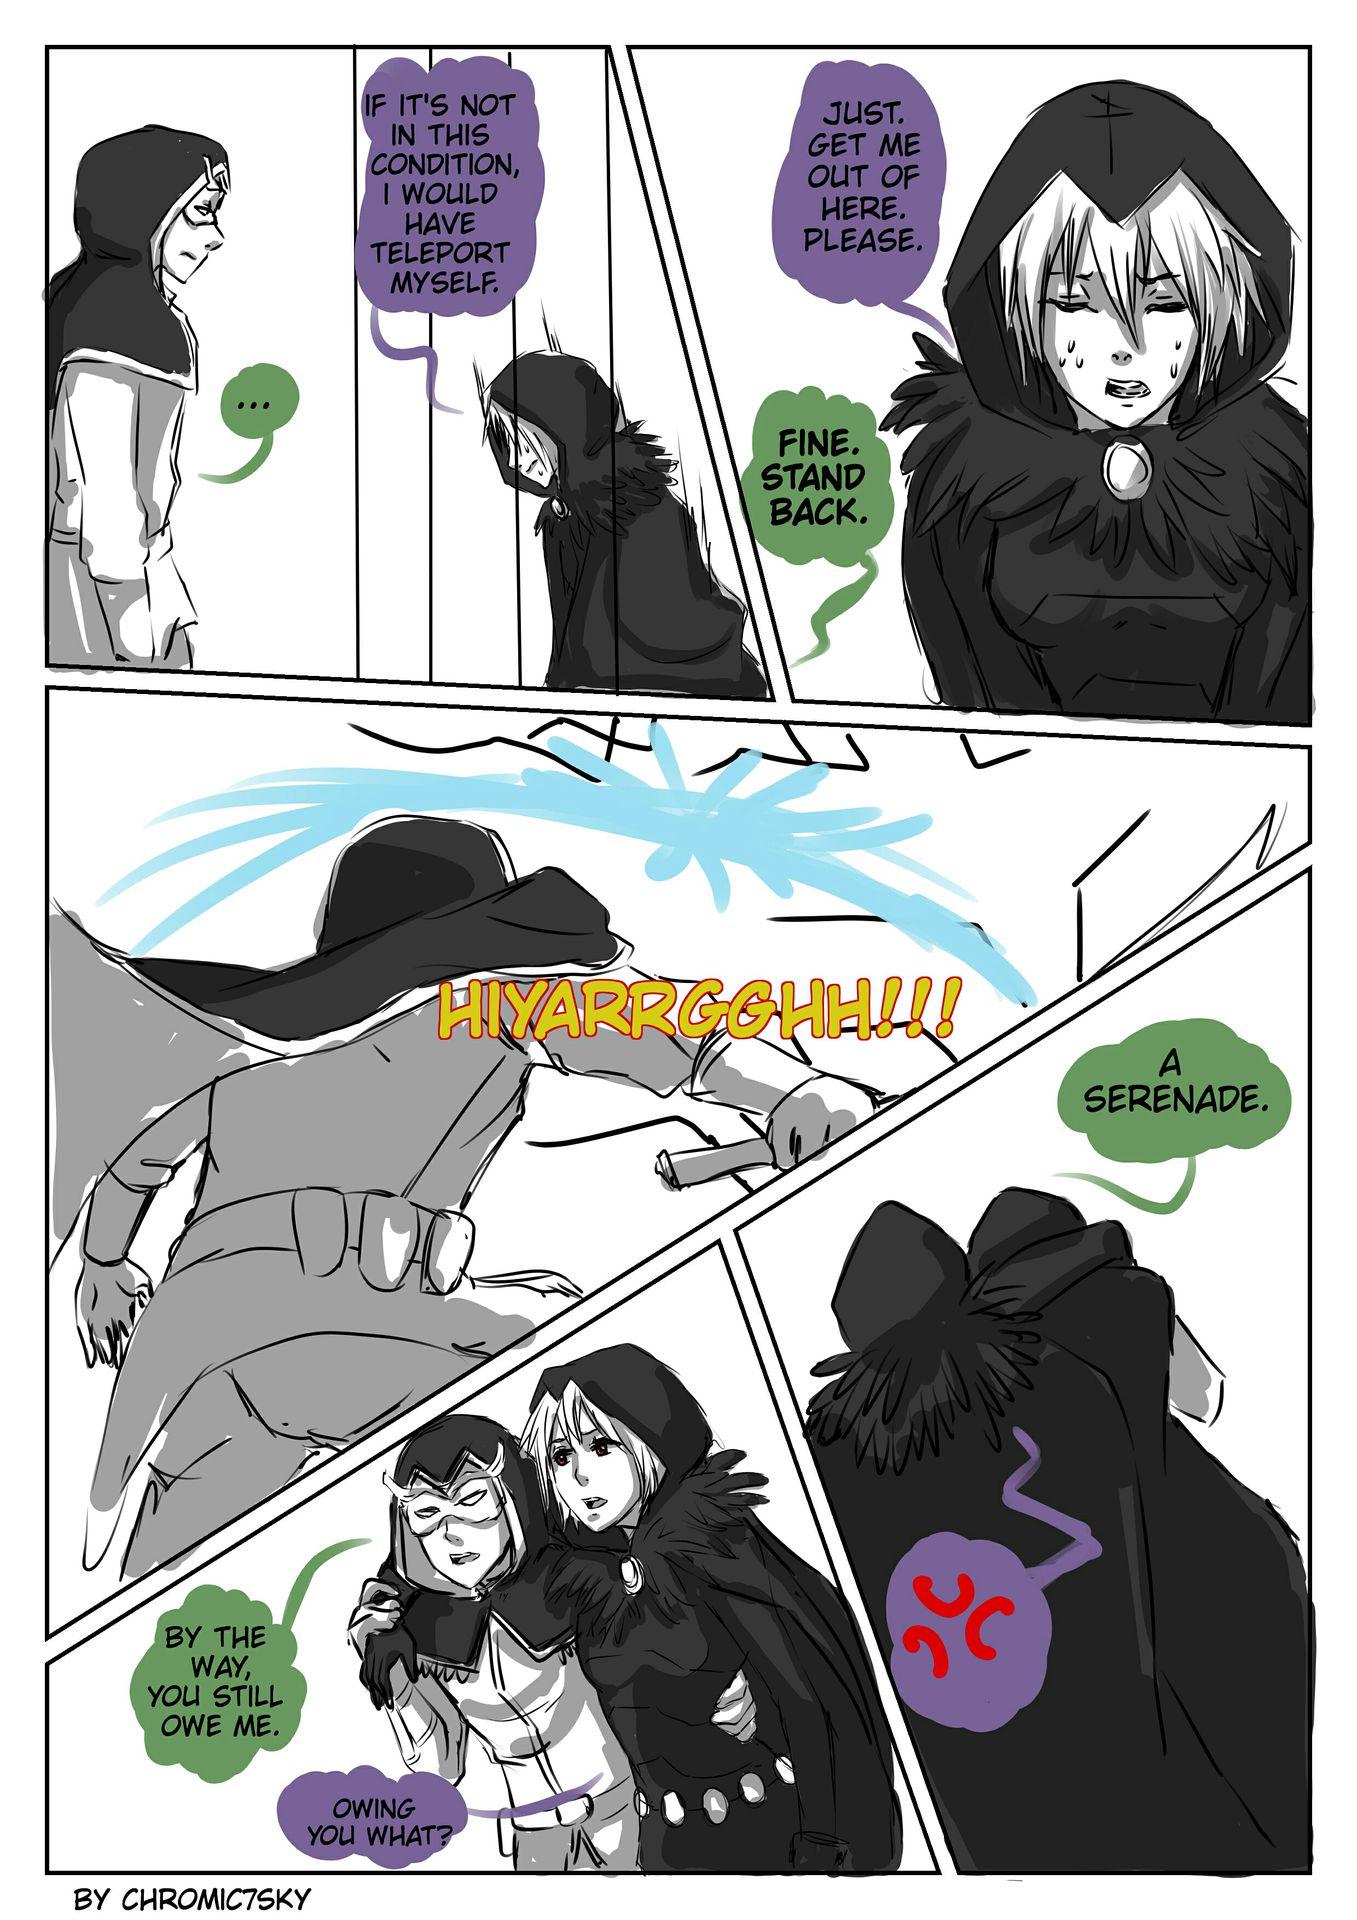 Damirae Comic Collection You Still Owe Me Raven Wattpad